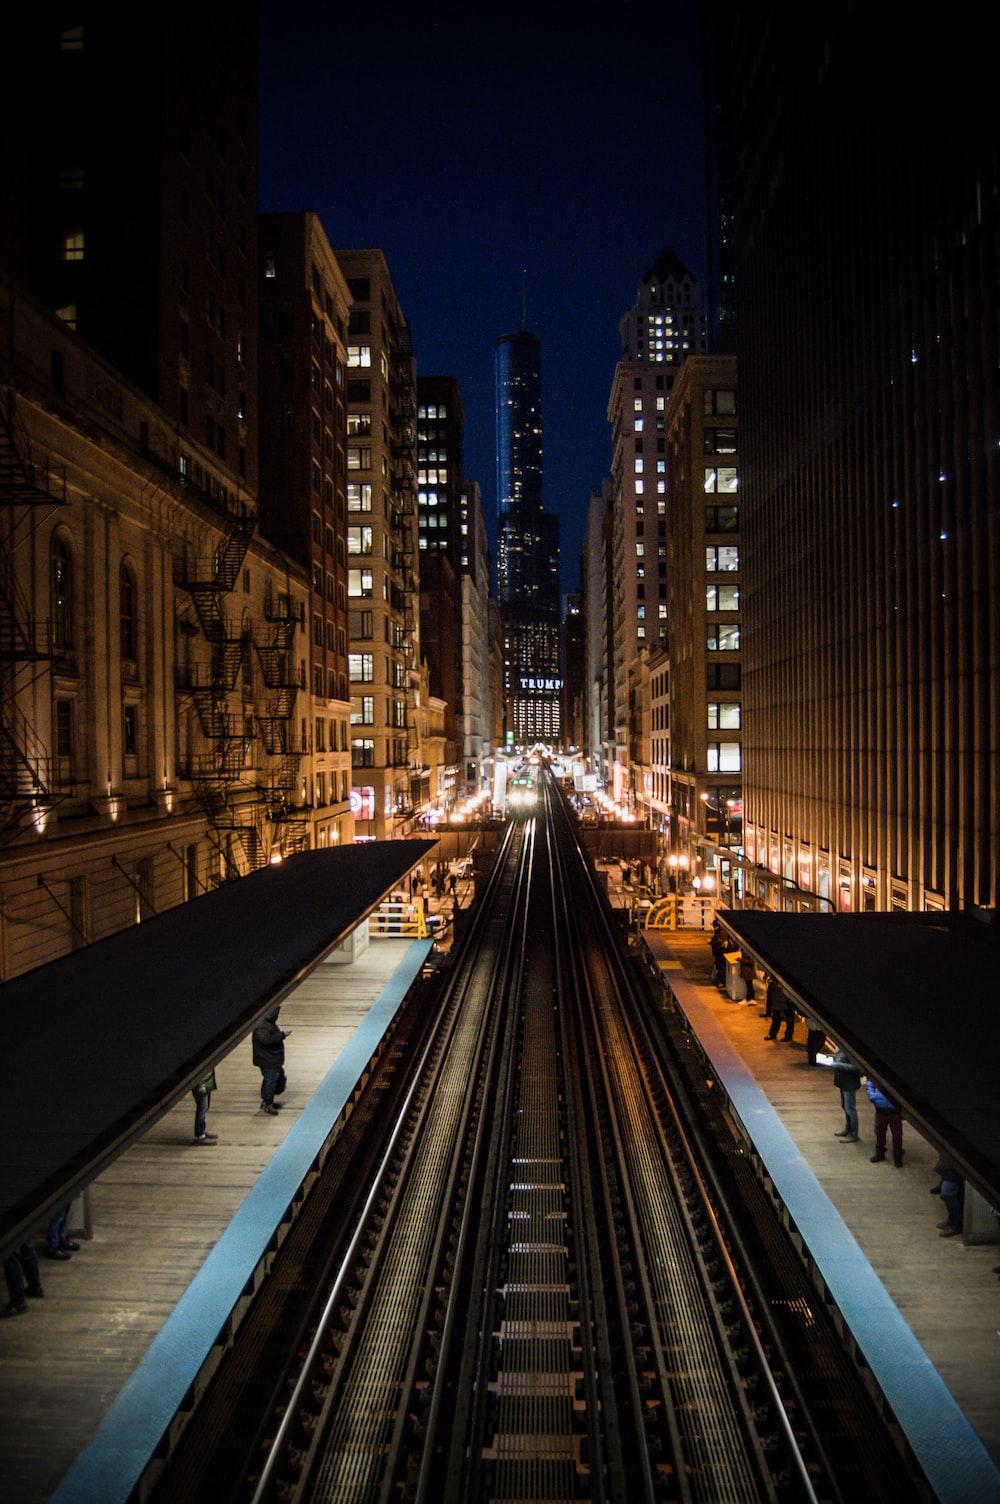 black metal train rail in between high rise buildings during night time